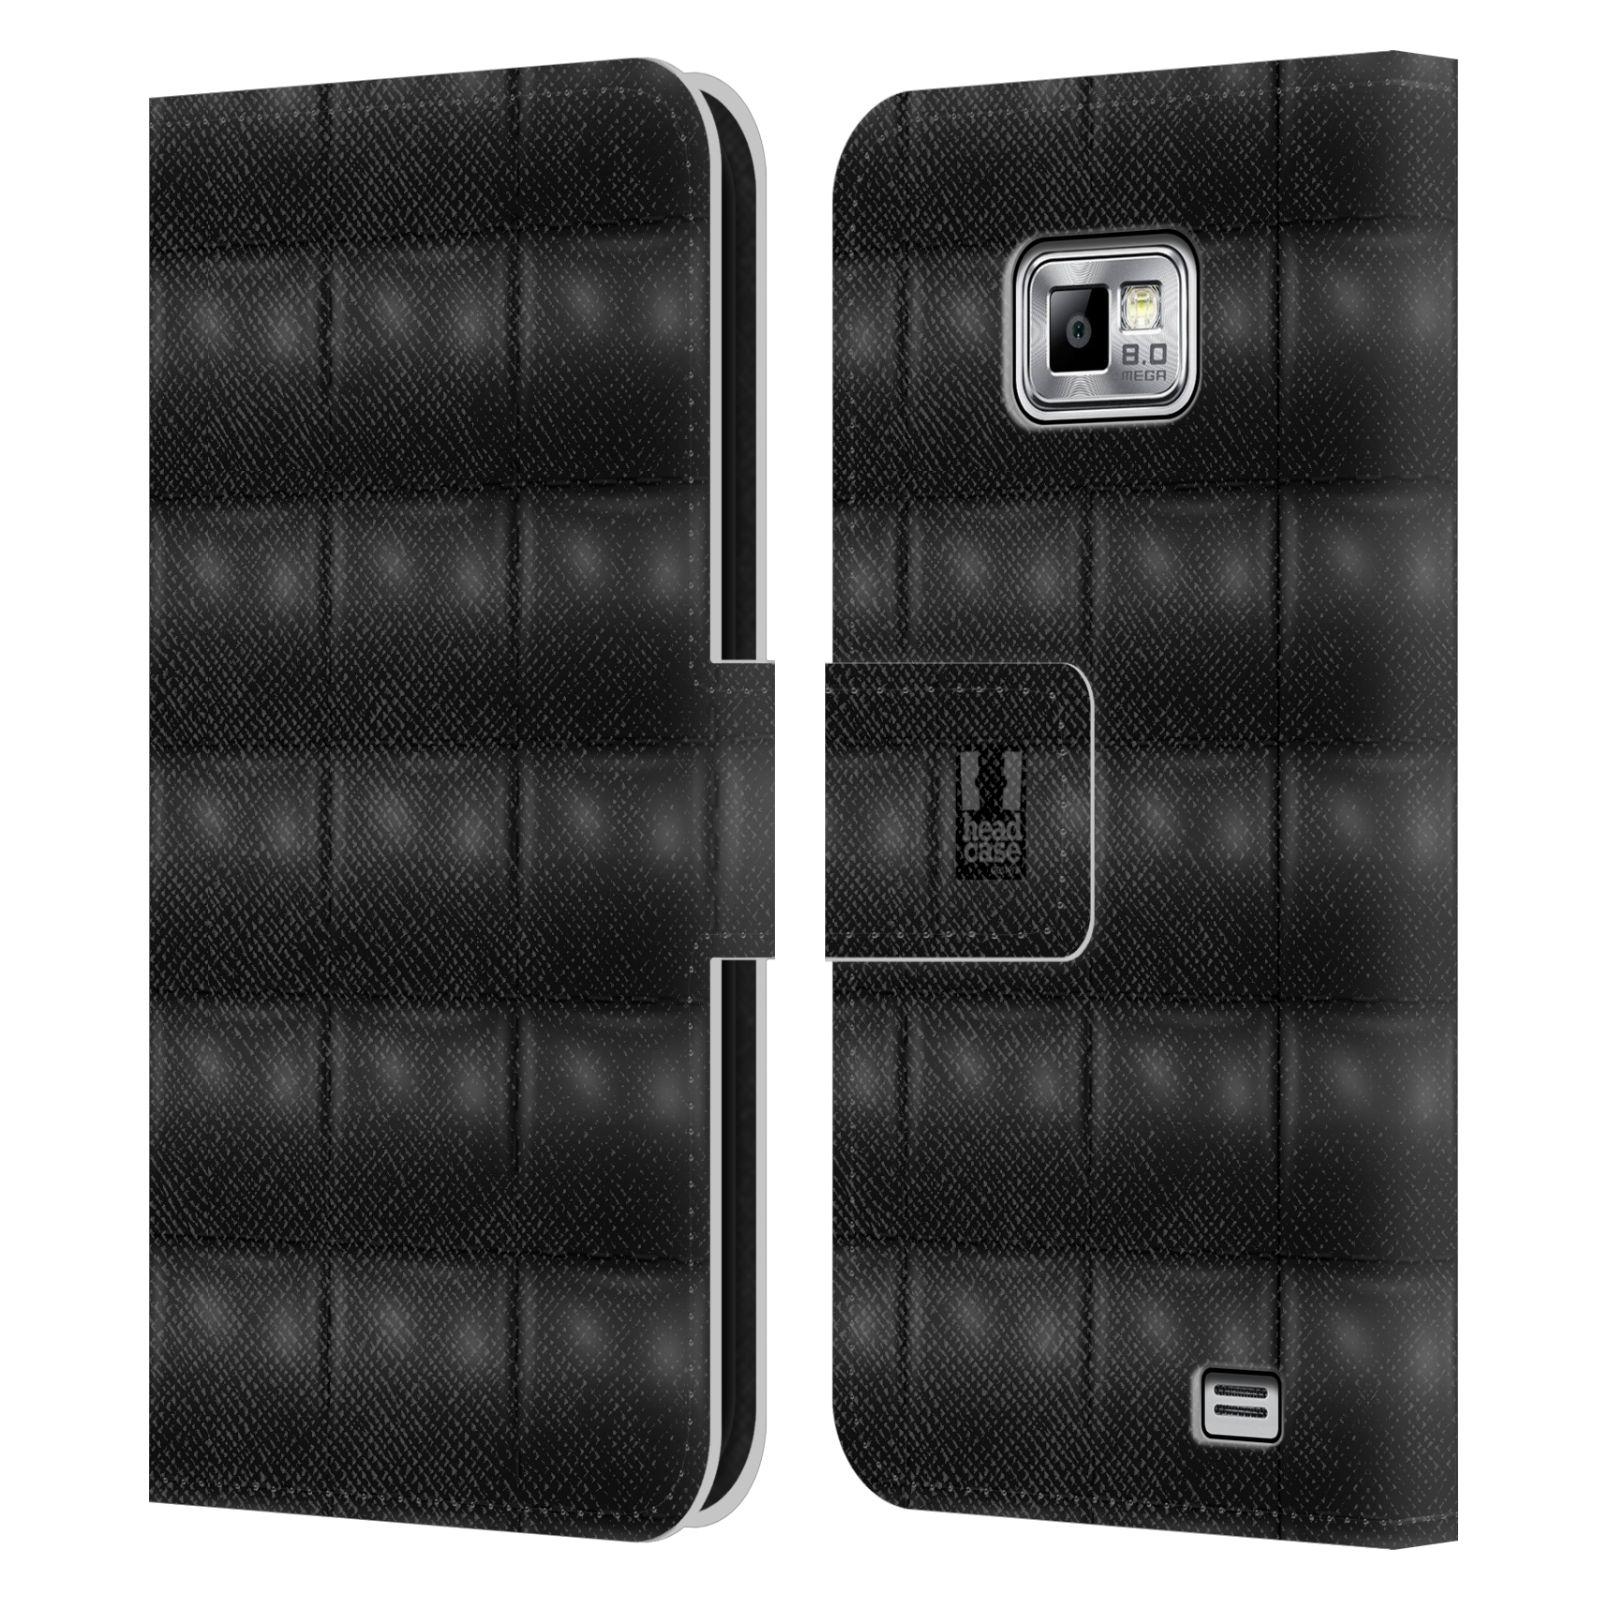 head case kissen brieftasche handyh lle aus leder f r samsung phones 2 ebay. Black Bedroom Furniture Sets. Home Design Ideas